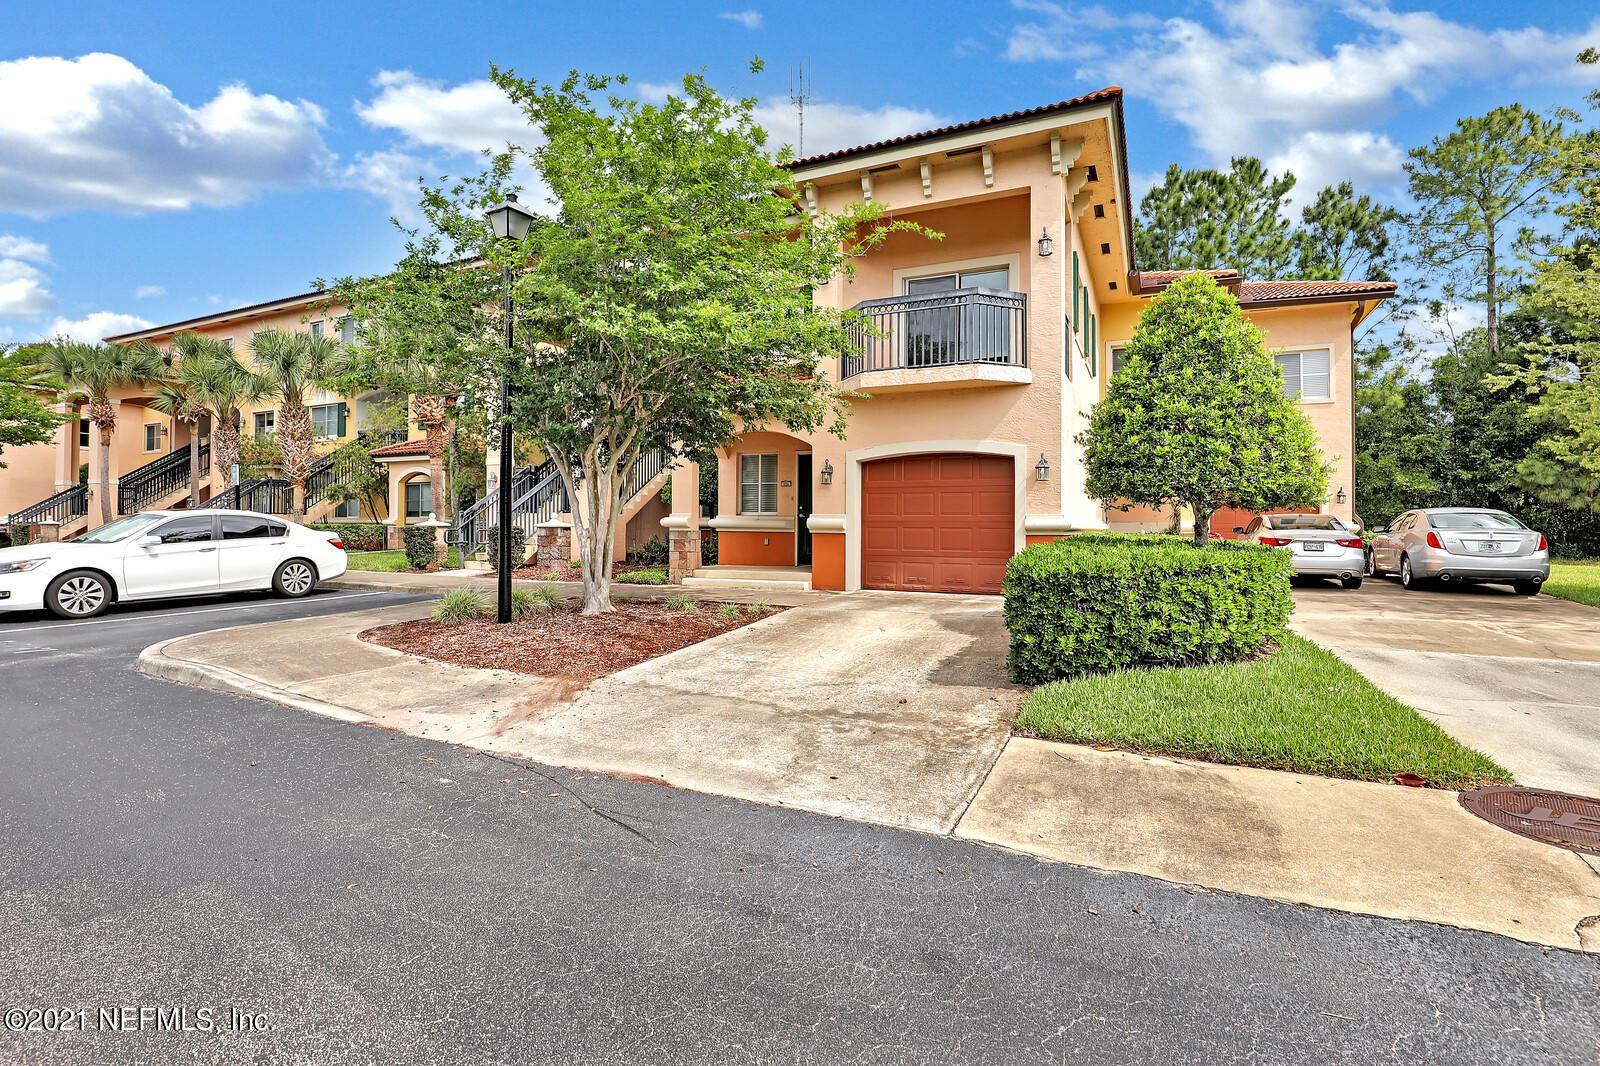 9745 TOUCHTON RD, Jacksonville, FL 32246 - MLS#: 1109804